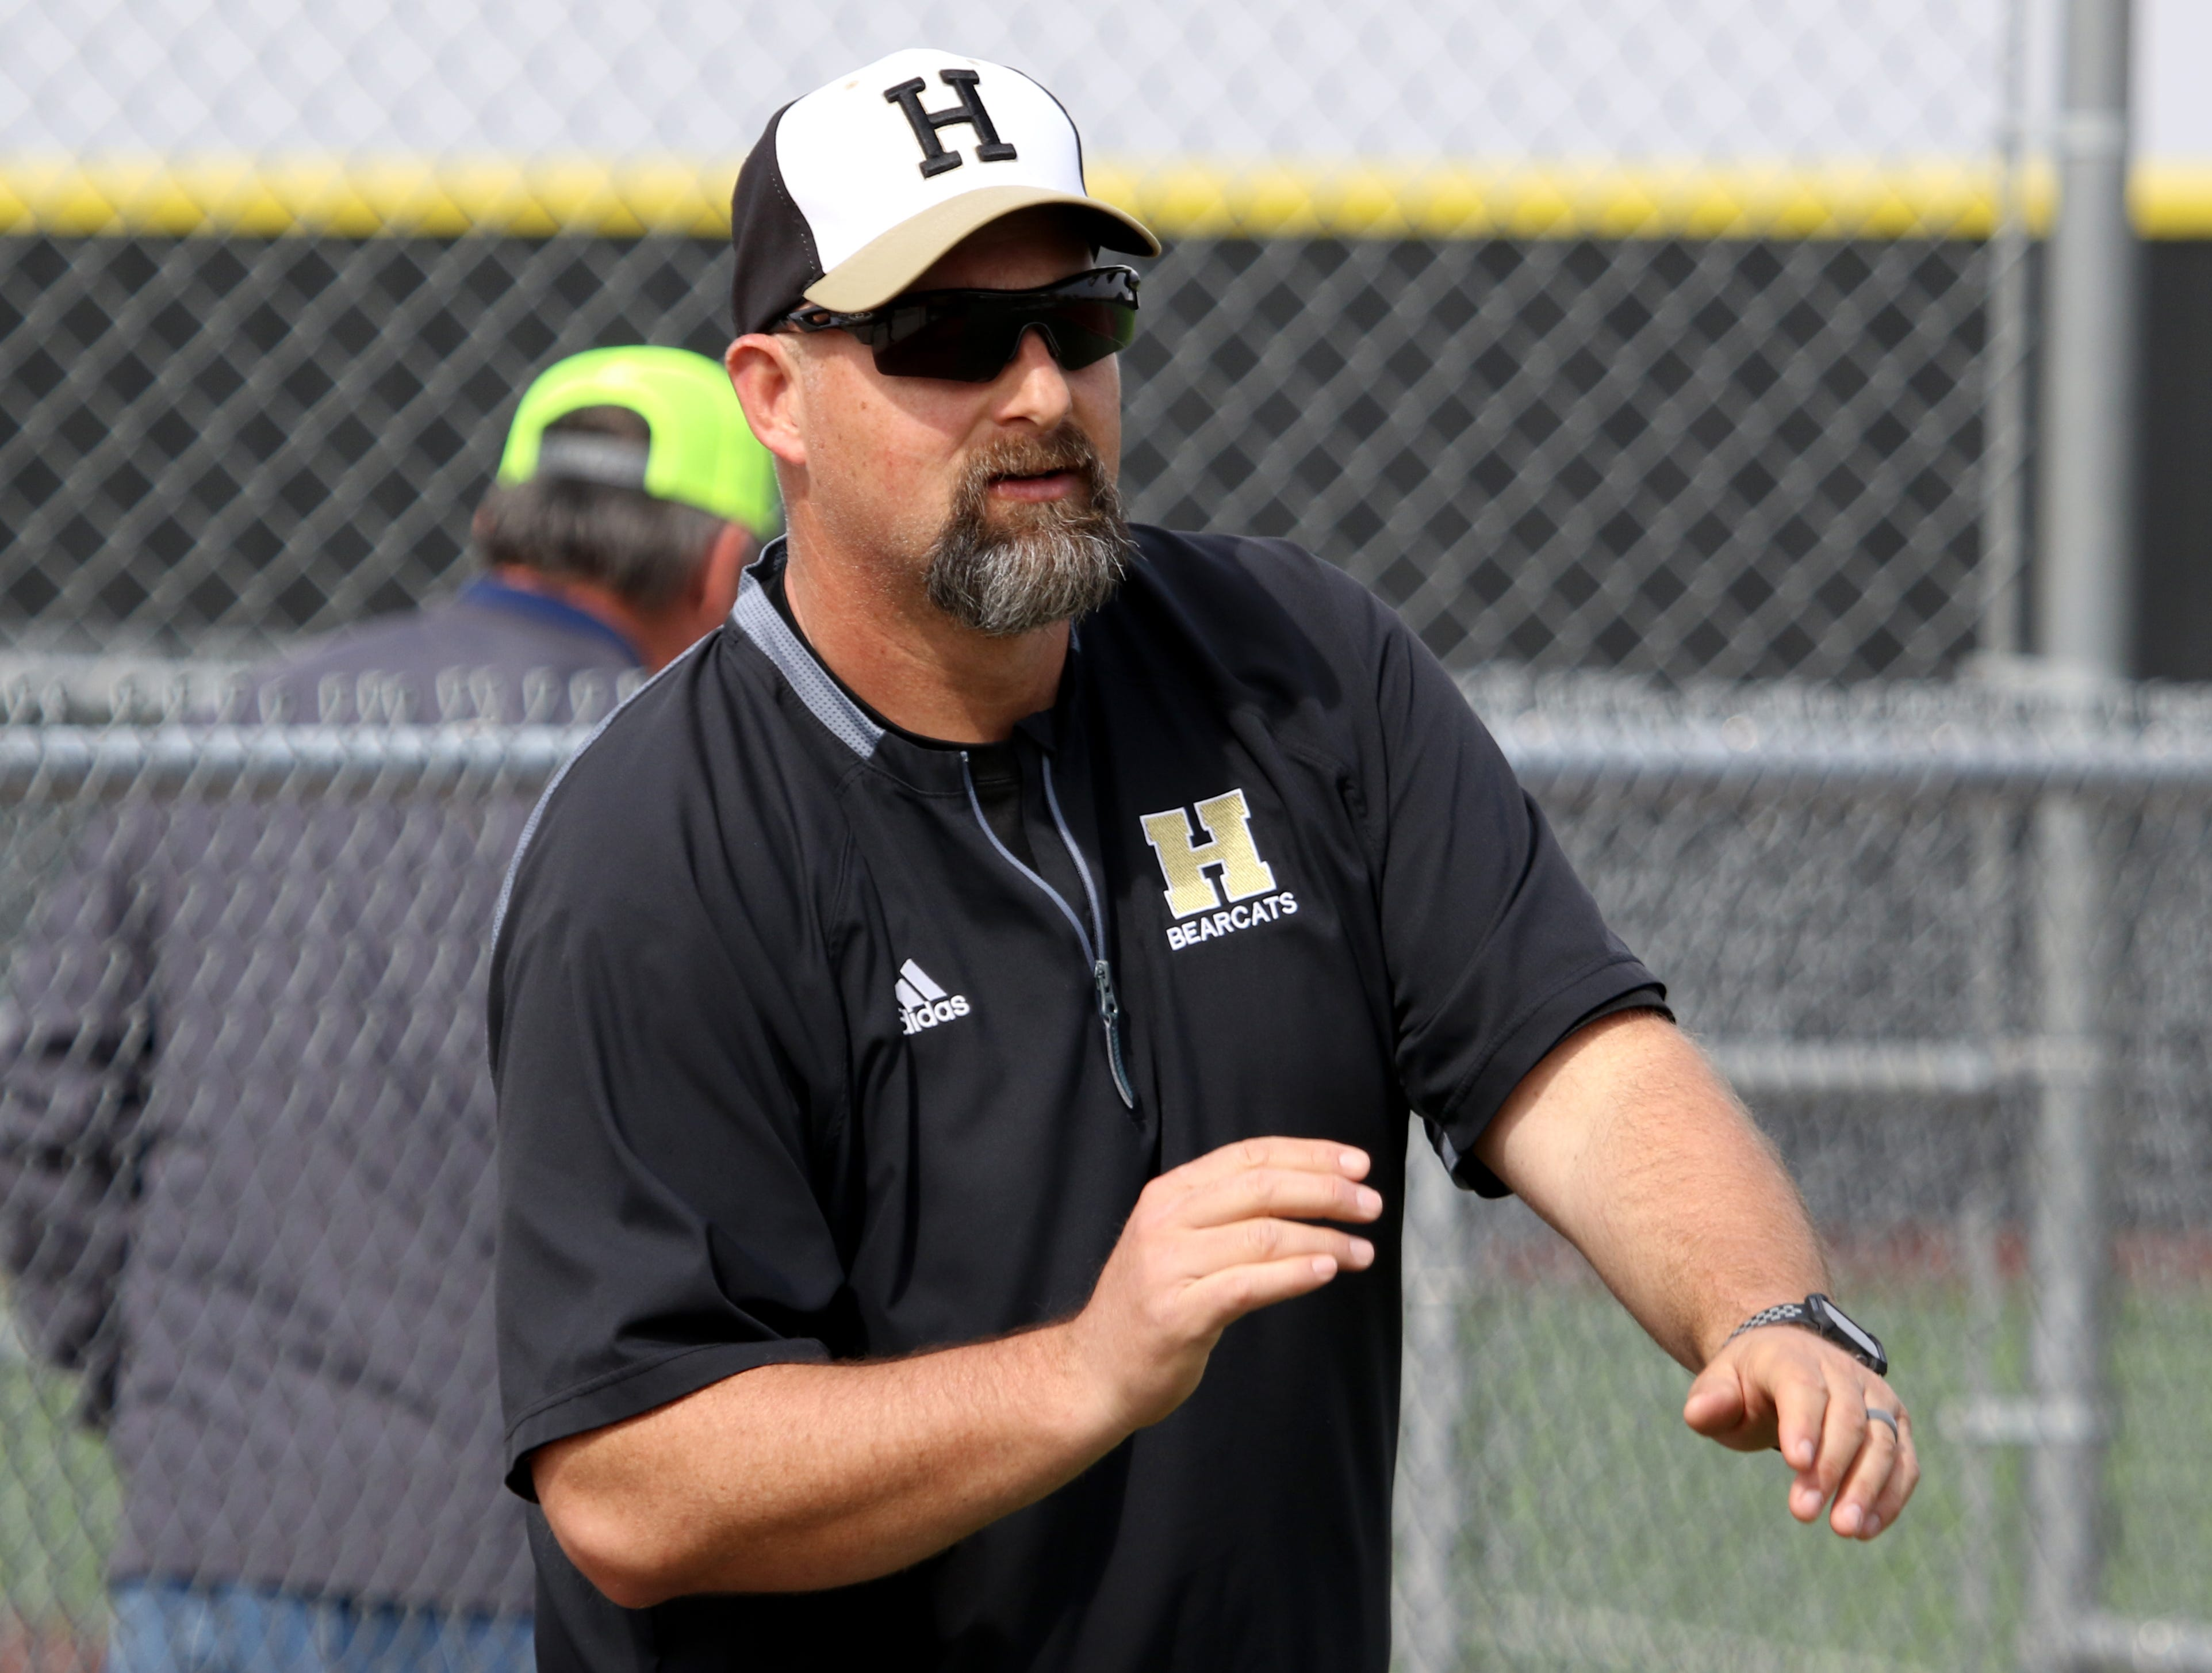 Henrietta head baseball coach Scott Broussard signals to his batter in the game against Burkburnett Friday, March 8 , 2019, in Henrietta.